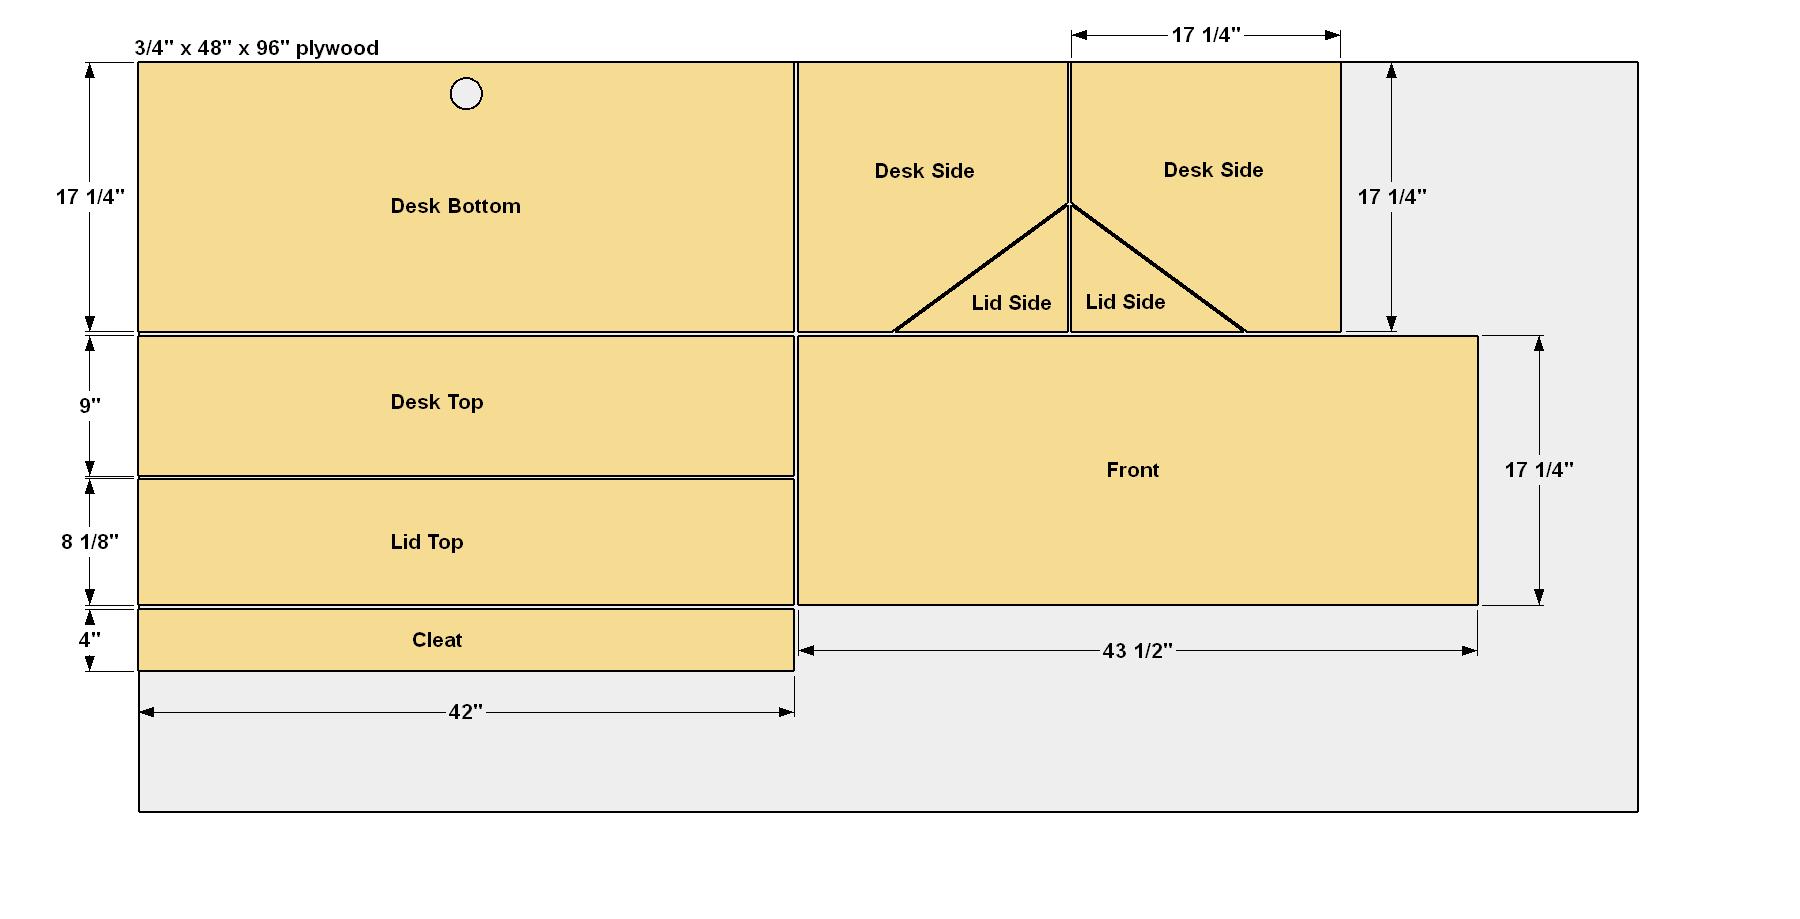 wall-mounted-desk-cut-diagram